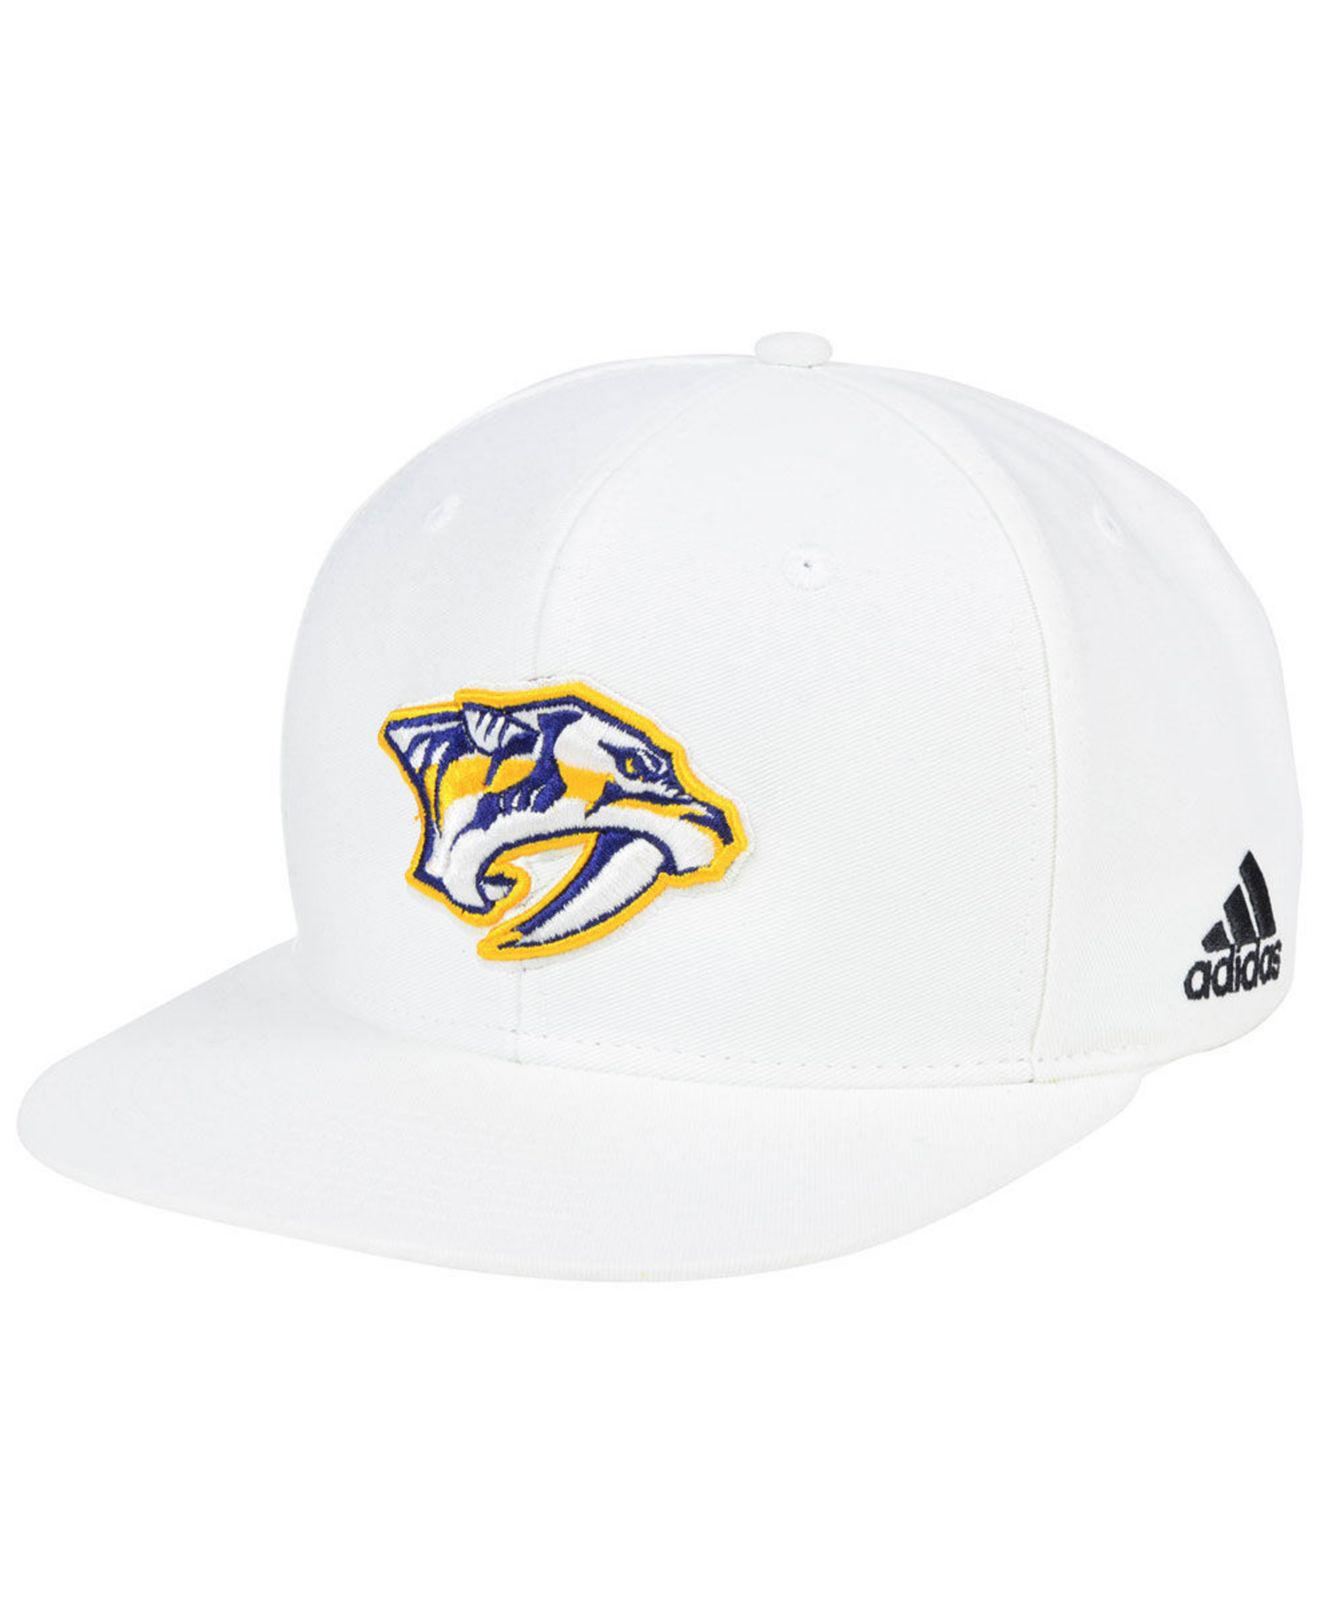 Lyst - adidas Nashville Predators Chase Snapback Cap in White for Men 00d2dd8de2e8